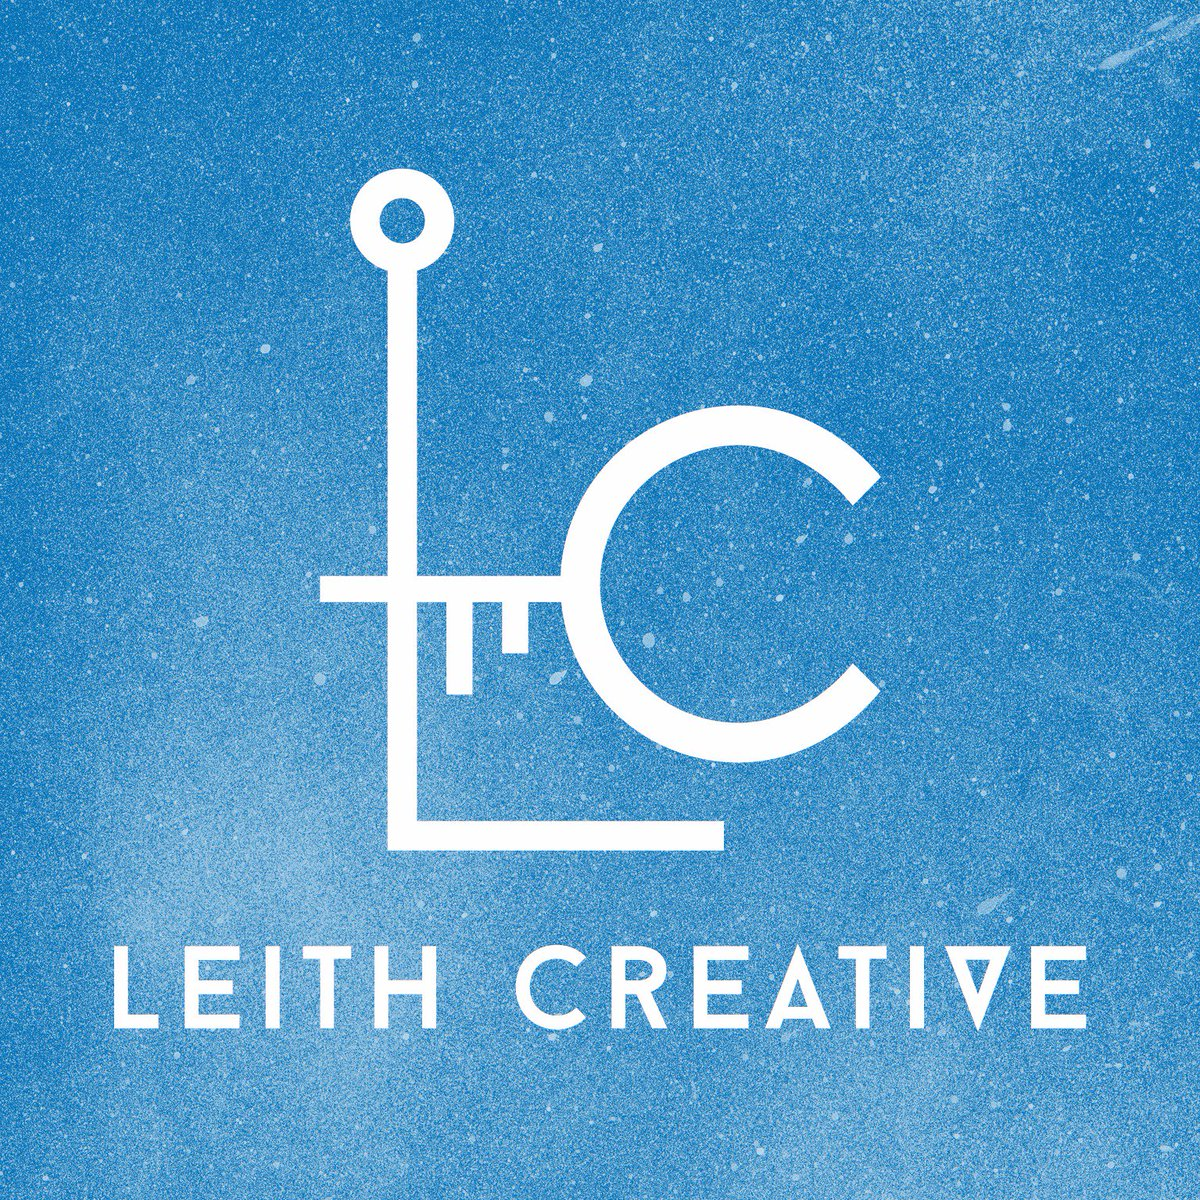 Leith creative leithcreative twitter creative scotland creative edinburgh scot gov culture and 5 others malvernweather Choice Image